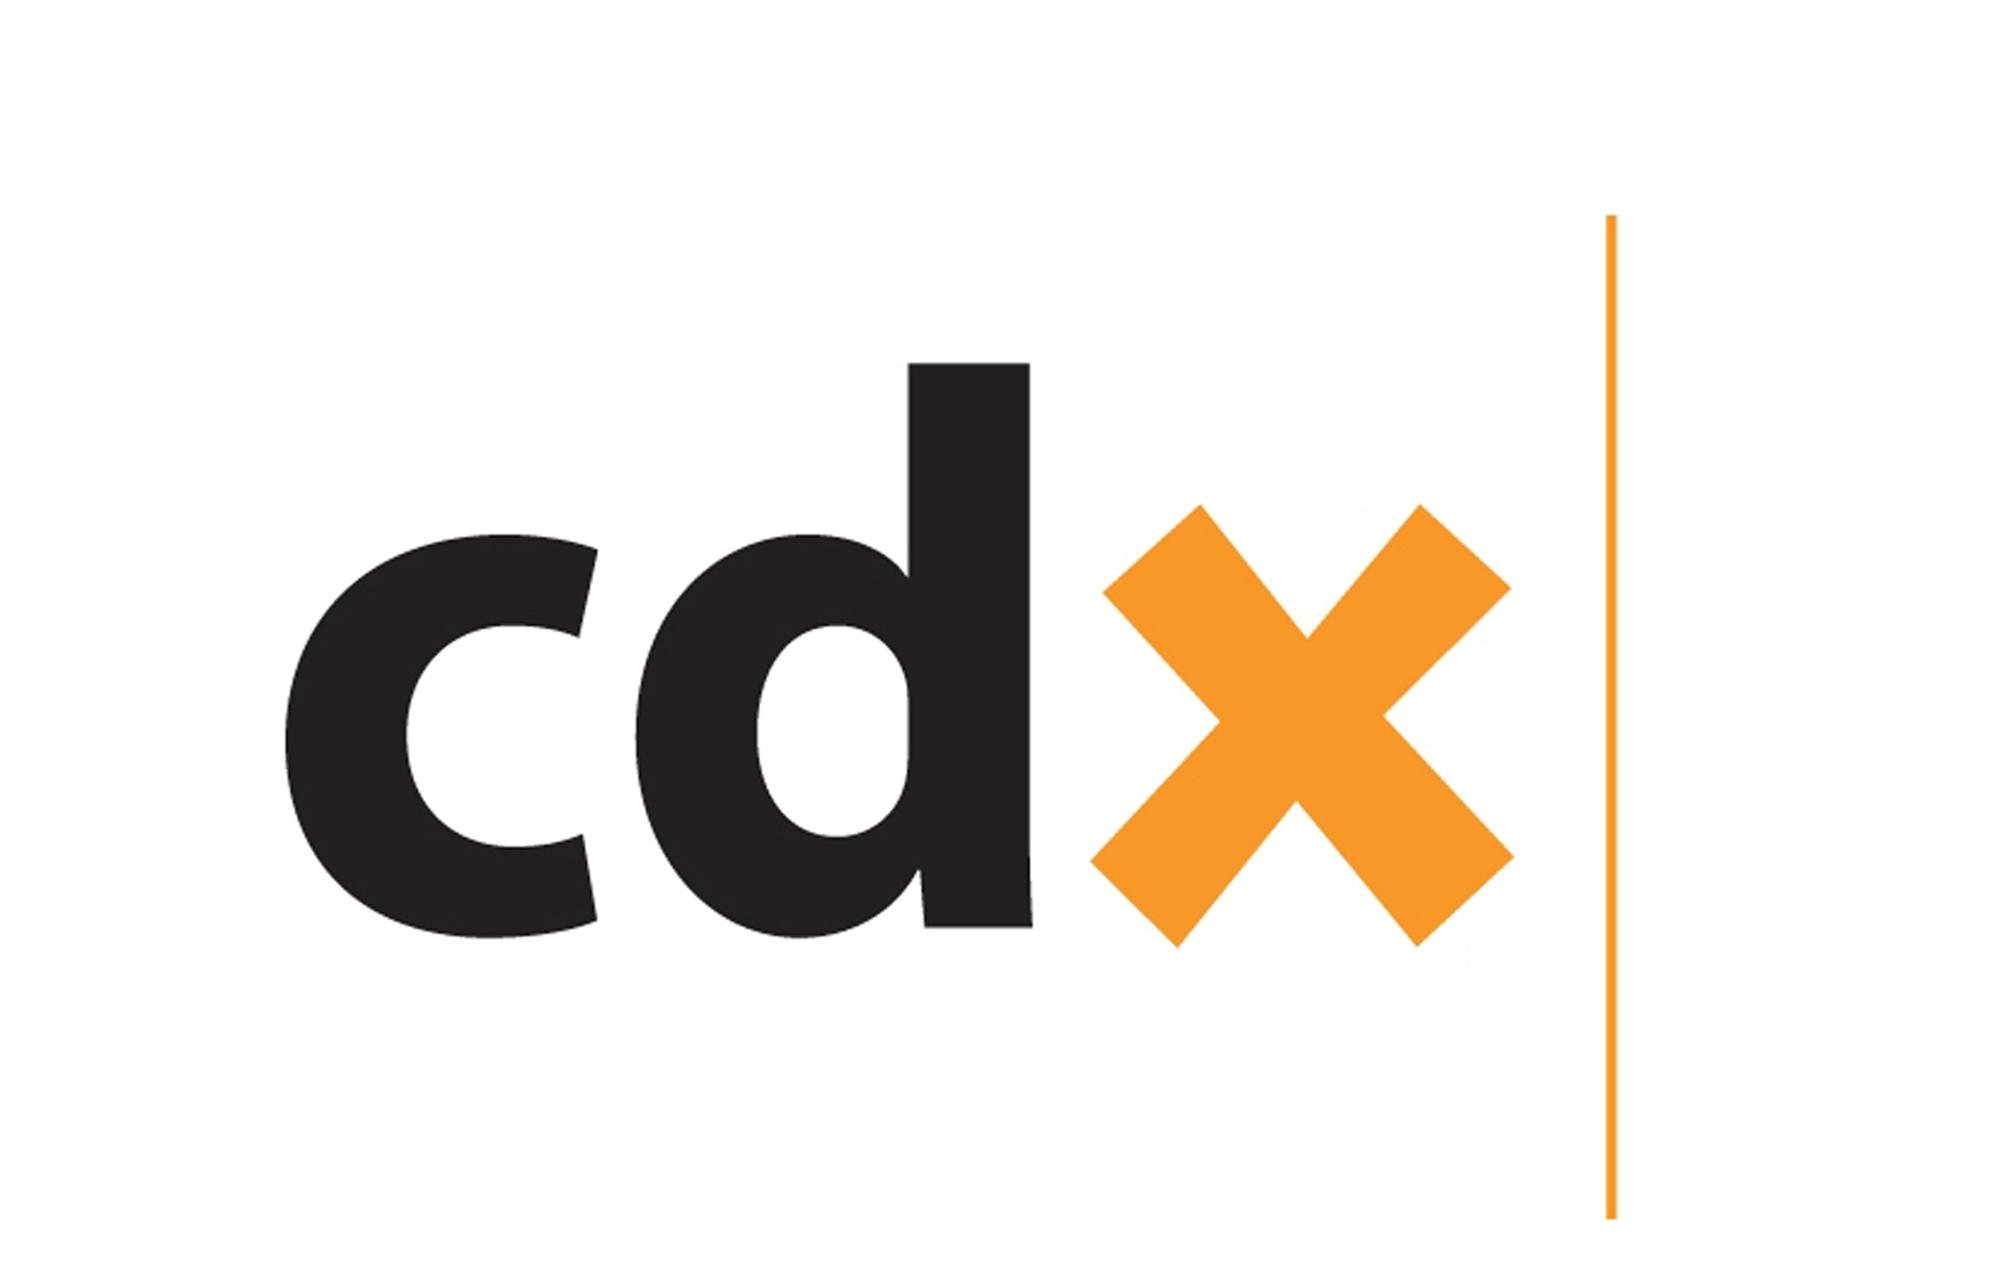 CDX logo